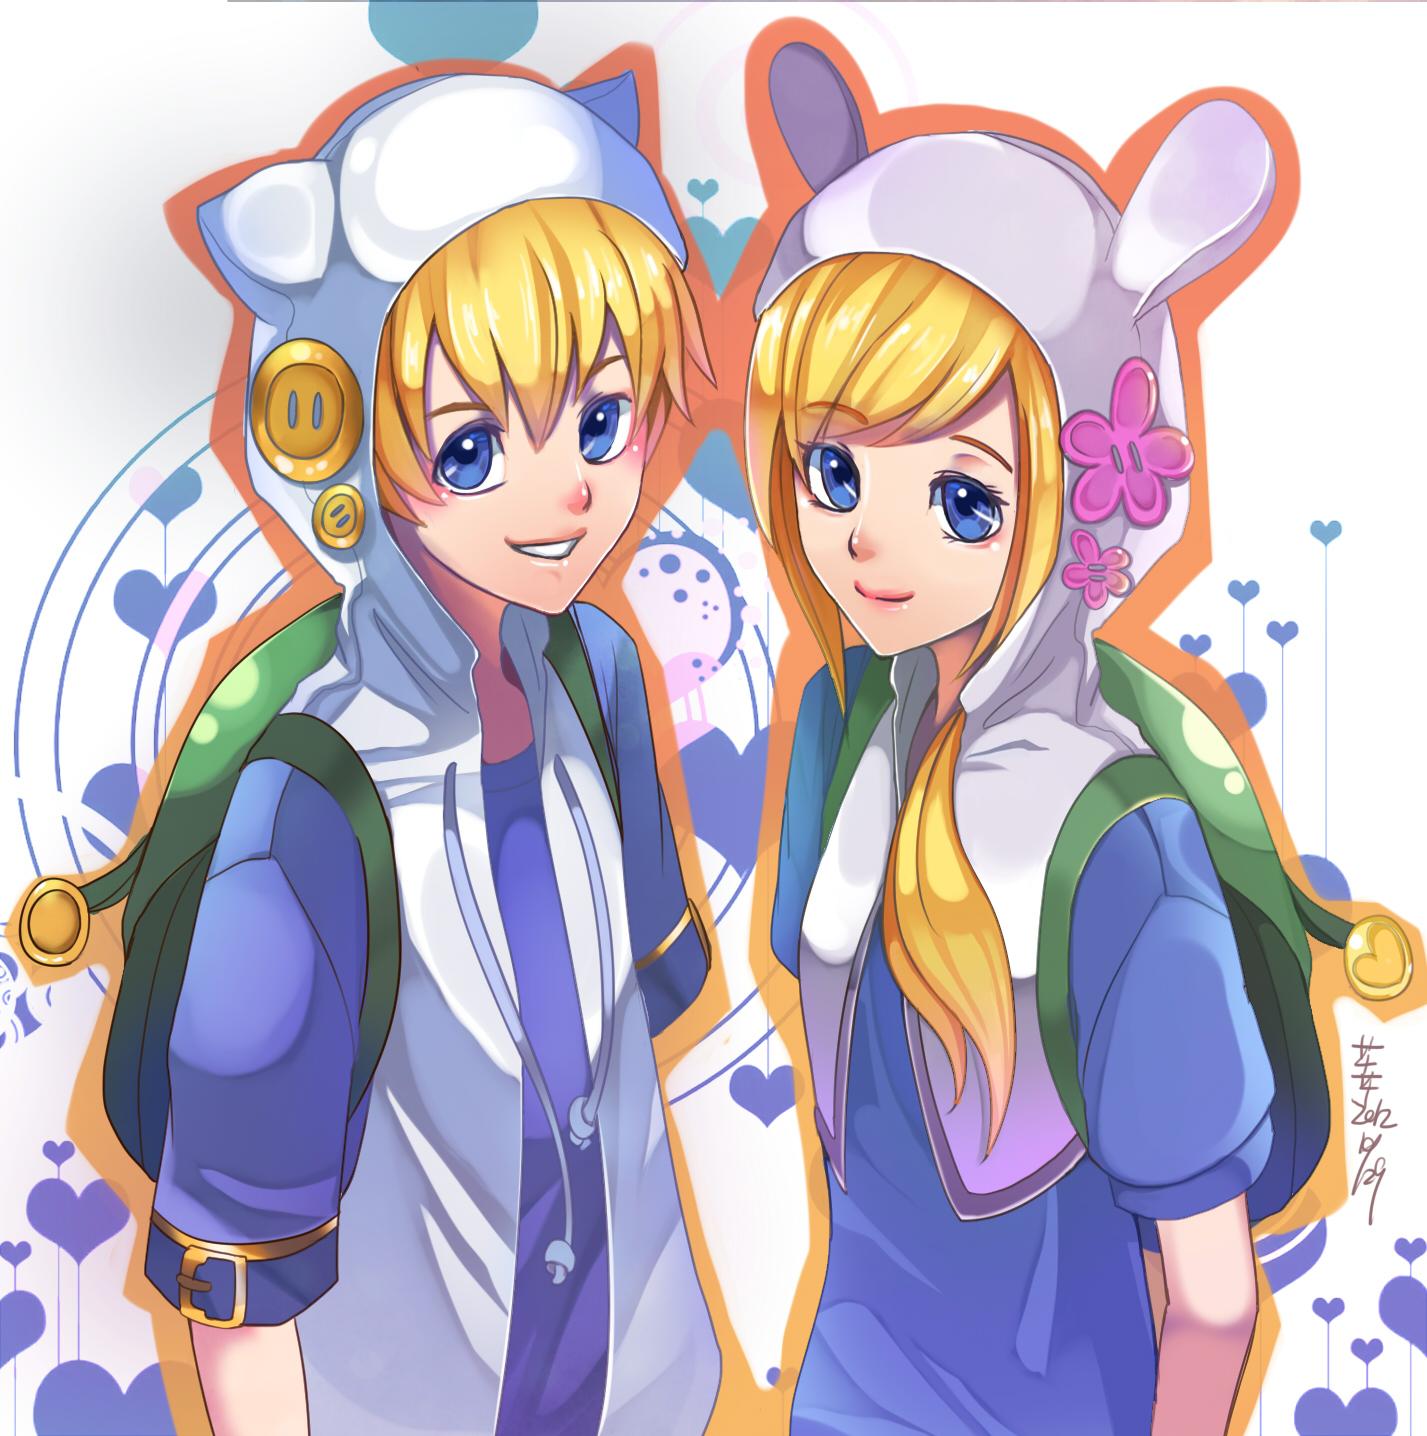 Adventure Time Image #1326115 - Zerochan Anime Image Board